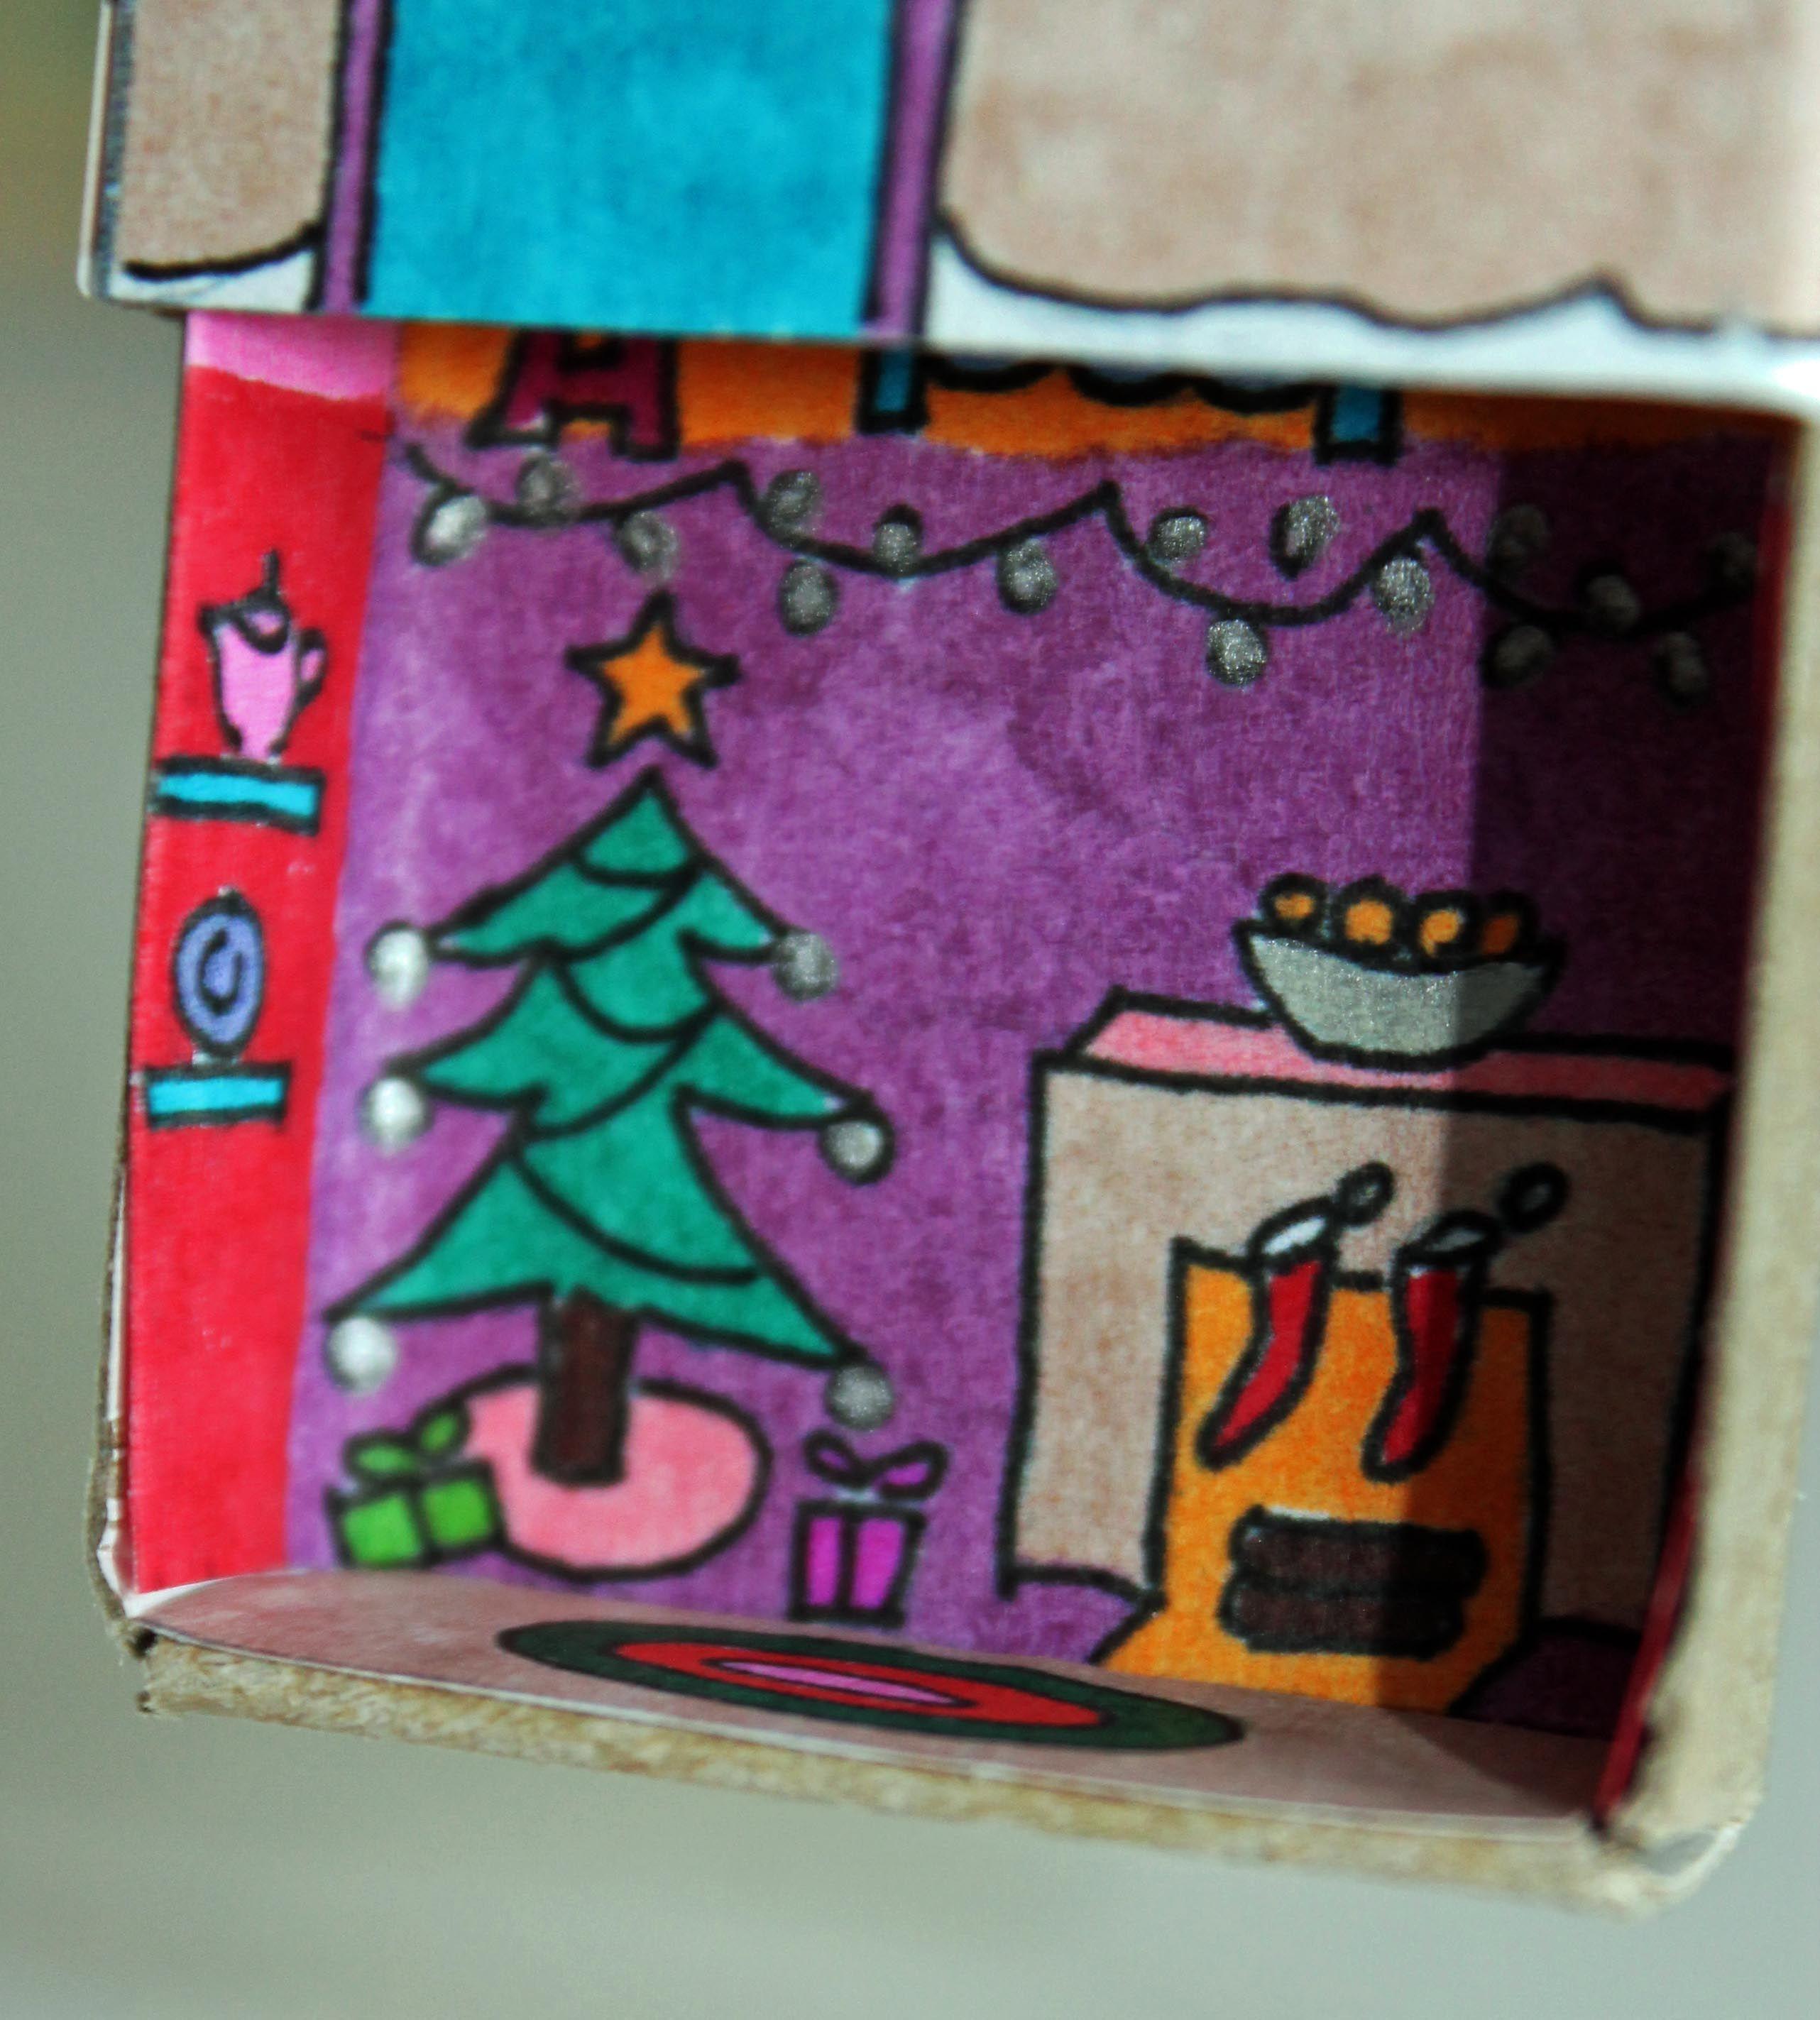 Matchbox House Original Make Your Own Matchbox House Mr